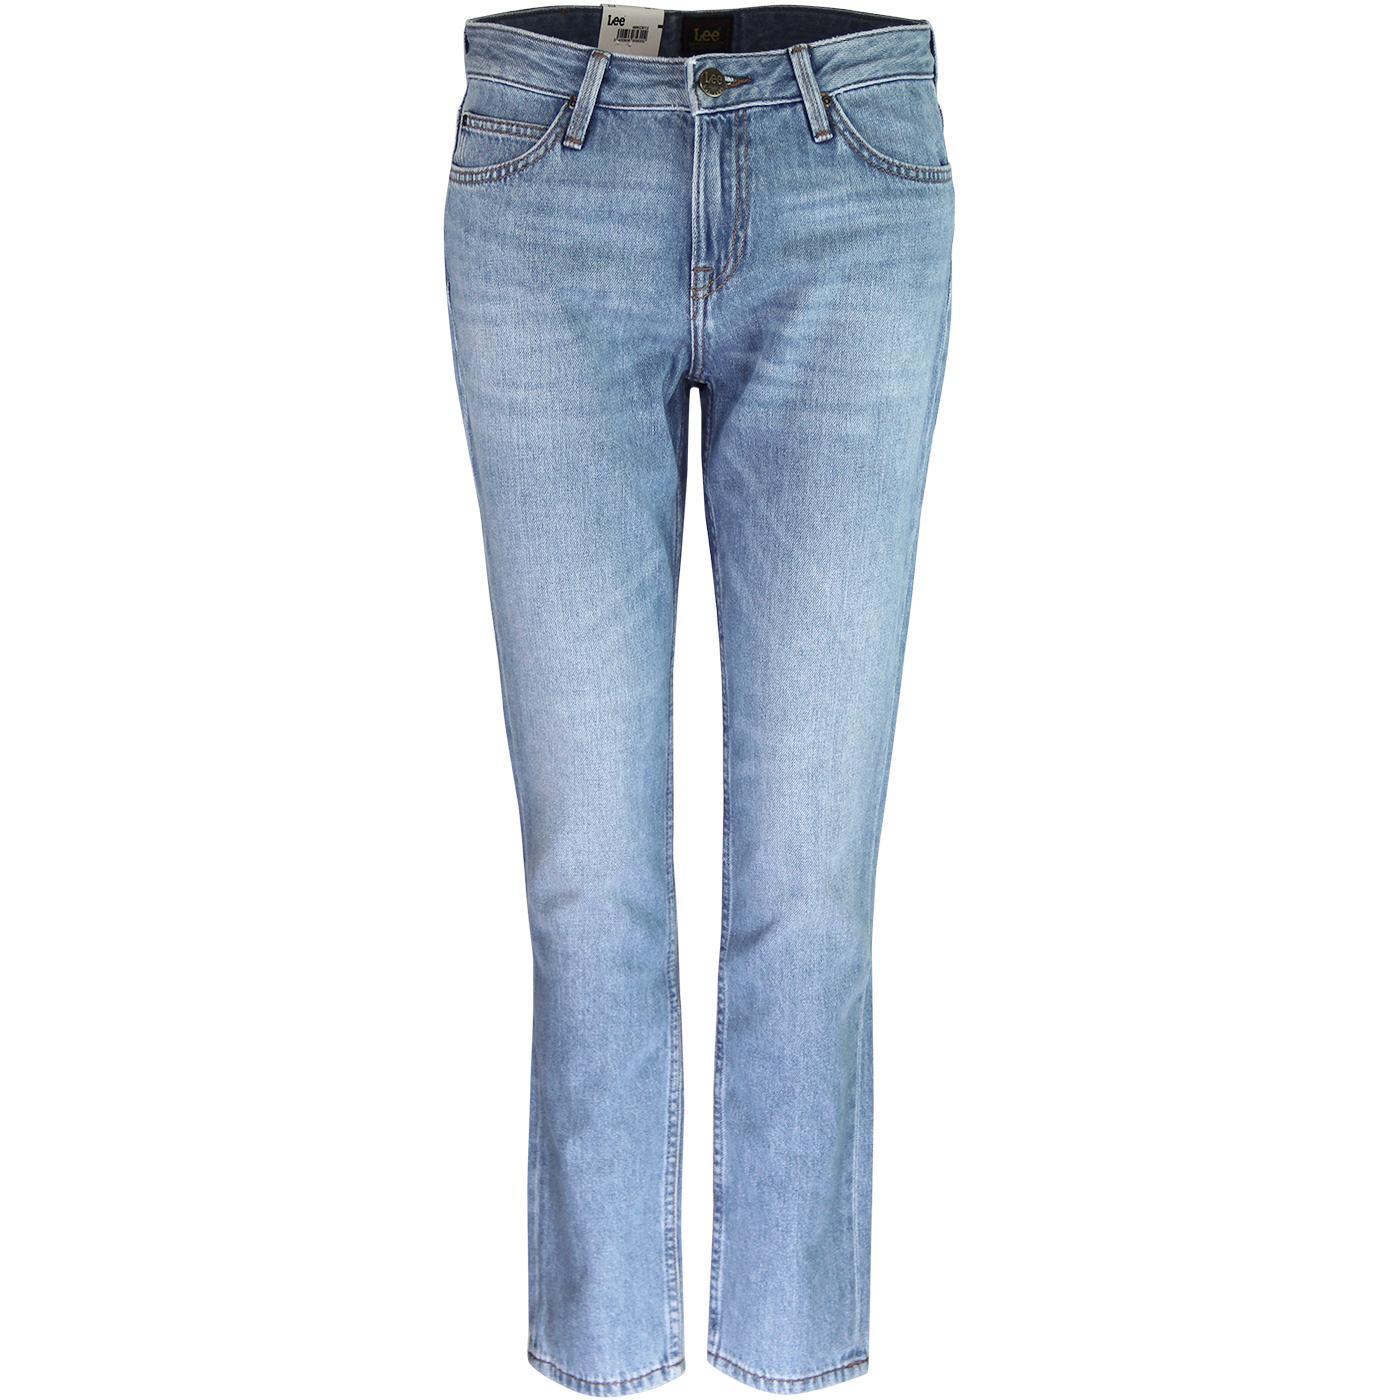 Elly LEE High Waist Slim Straight Denim Jeans (FL)